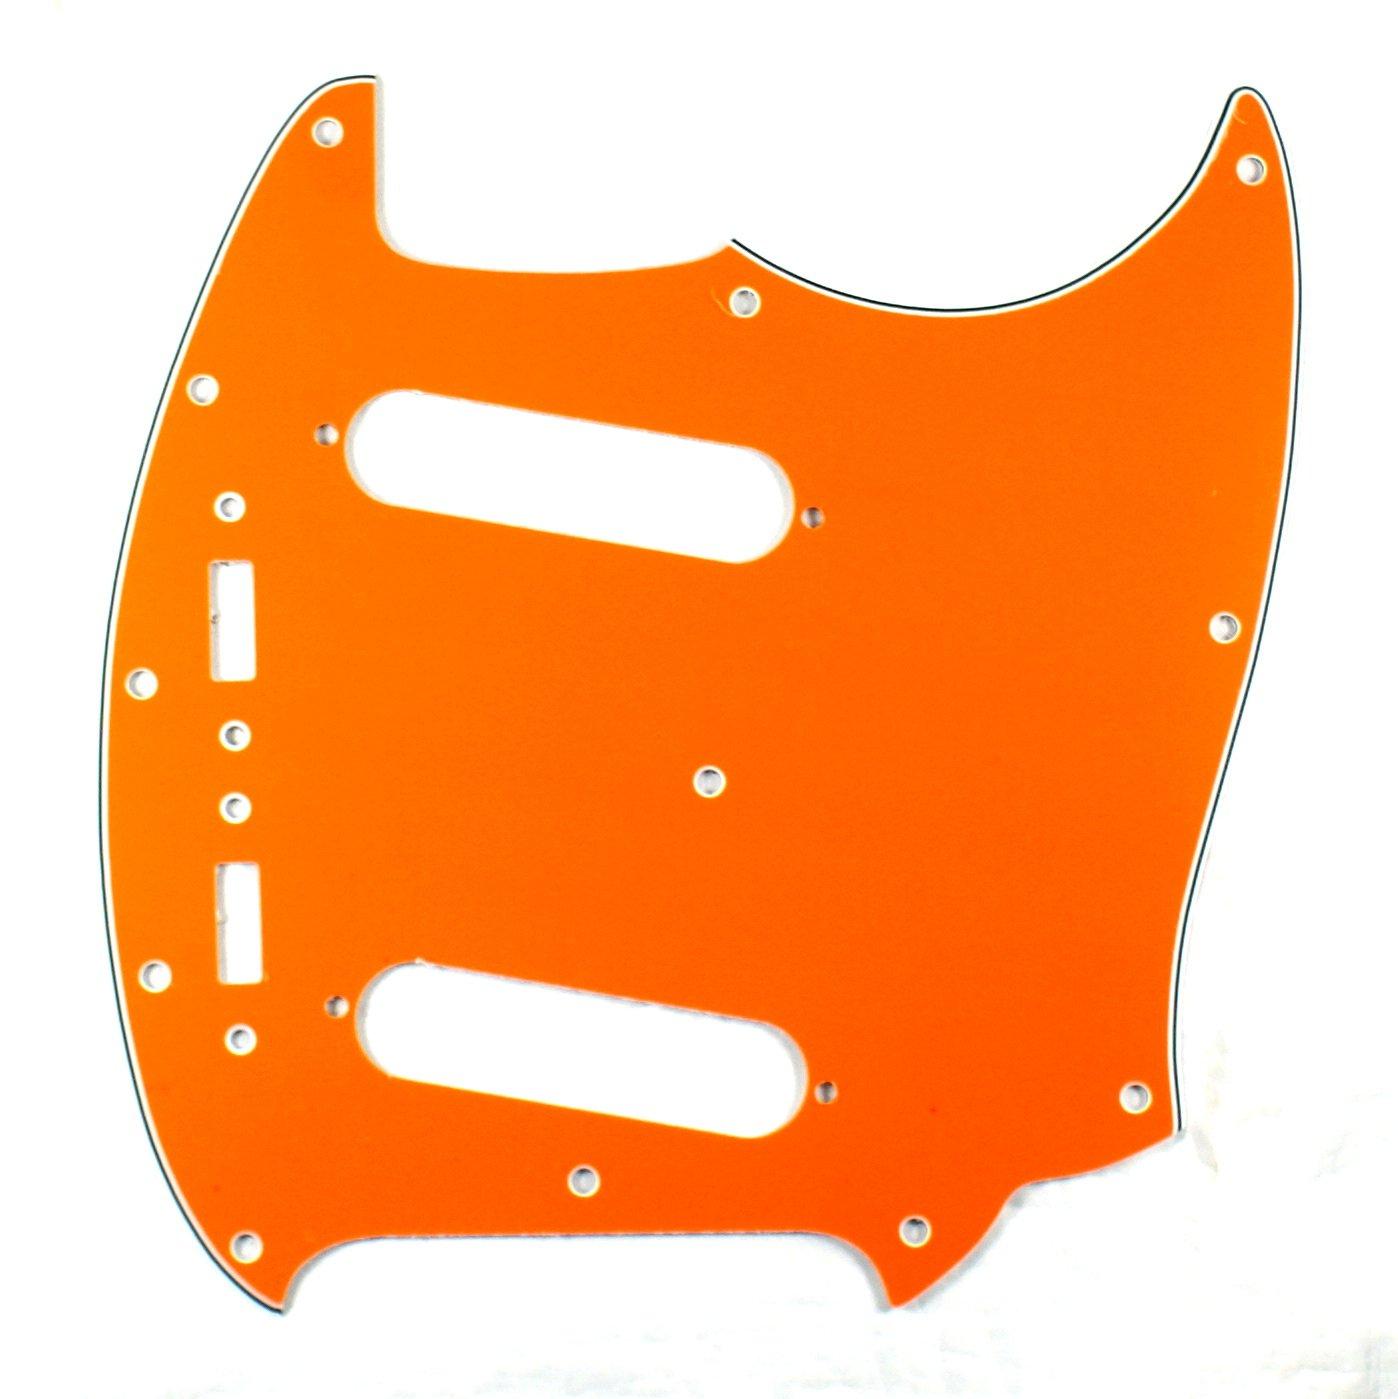 (E66) Custom Guitar Pickguard Fits Mustang Classic Series ,4 Ply Orange